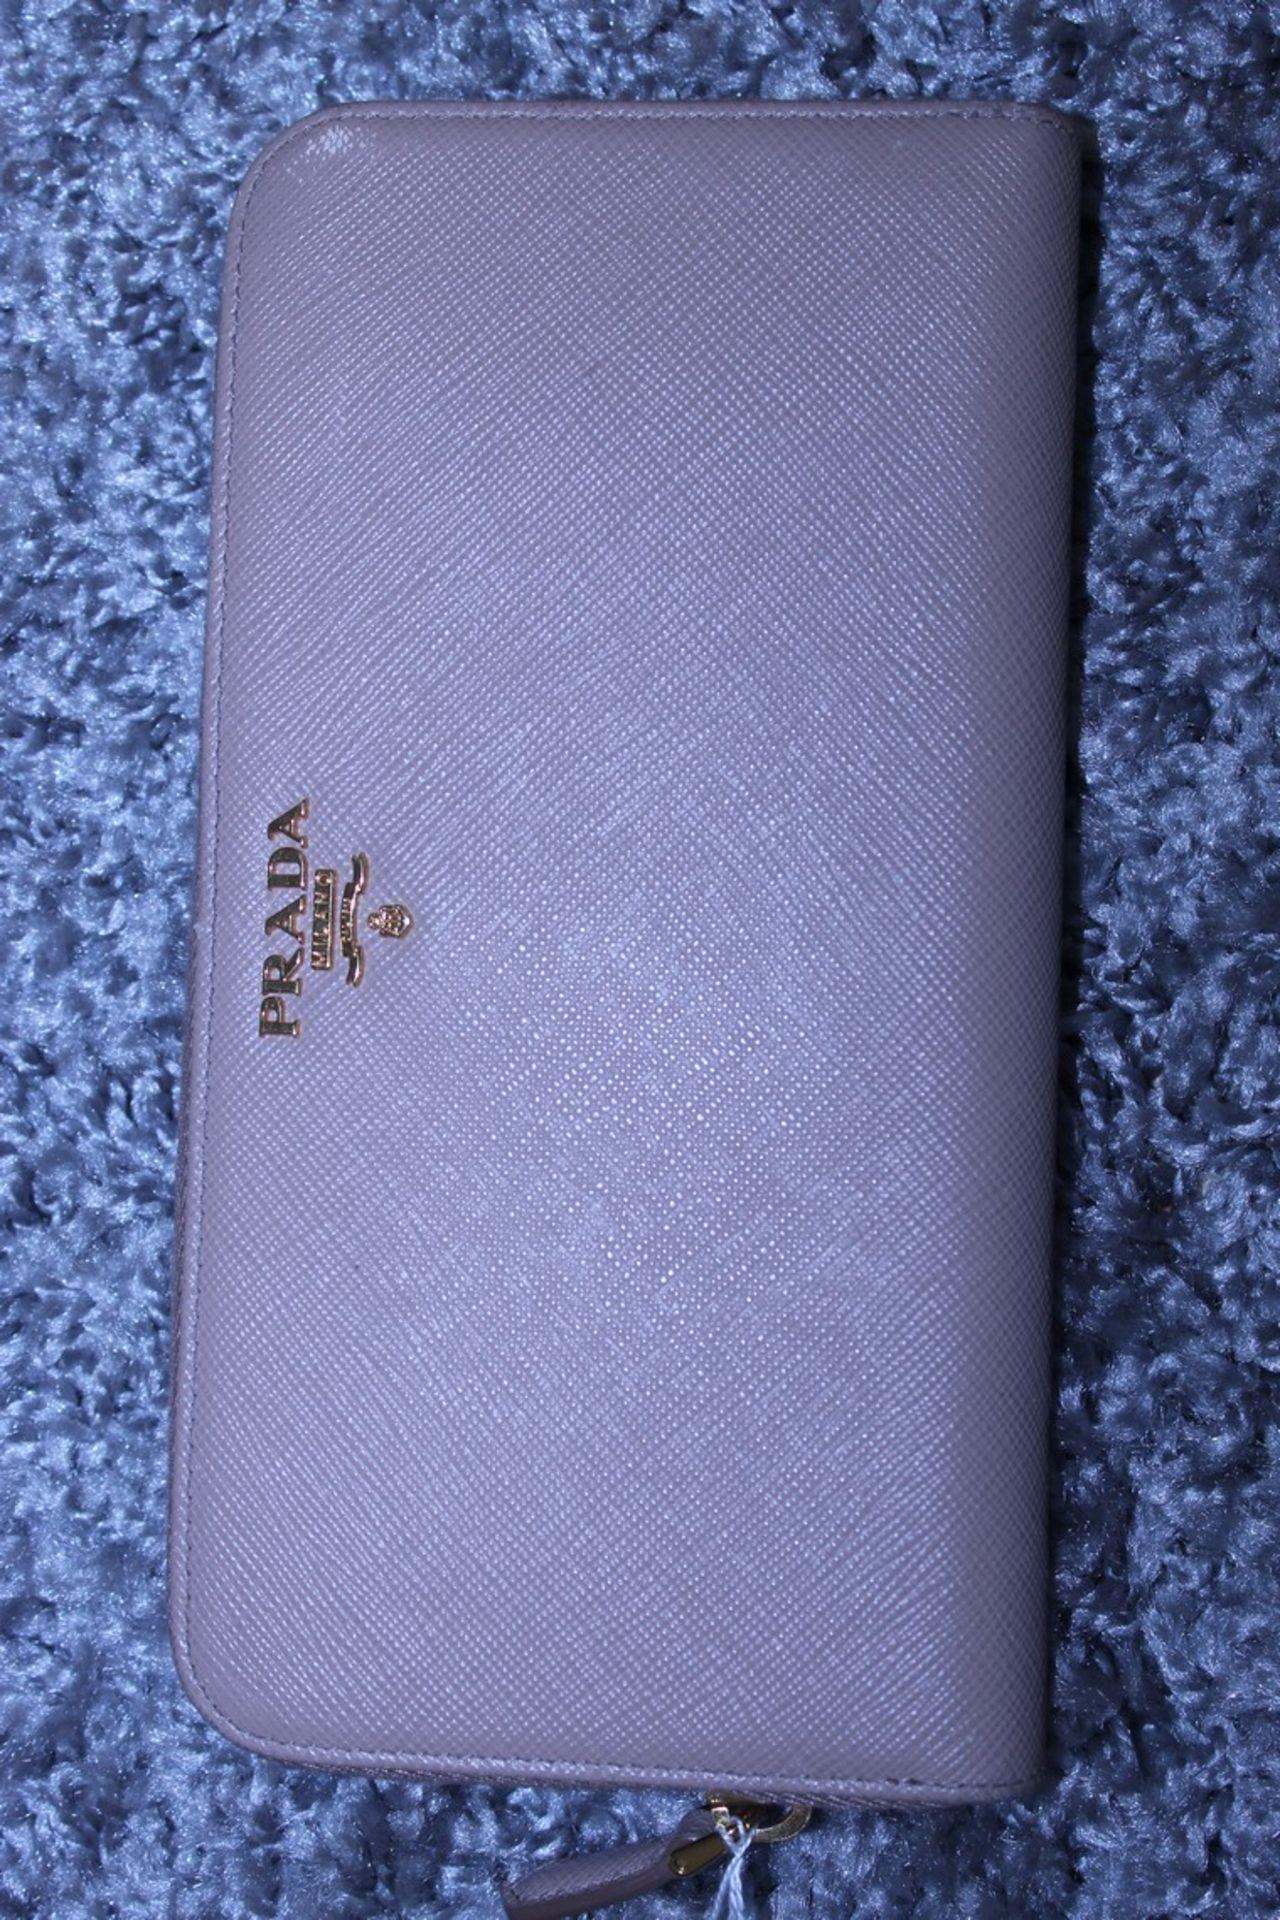 RRP £590 Prada Continental Wallet, Beige Saffiano Leather, 20X10Cm (Production Code 107D)